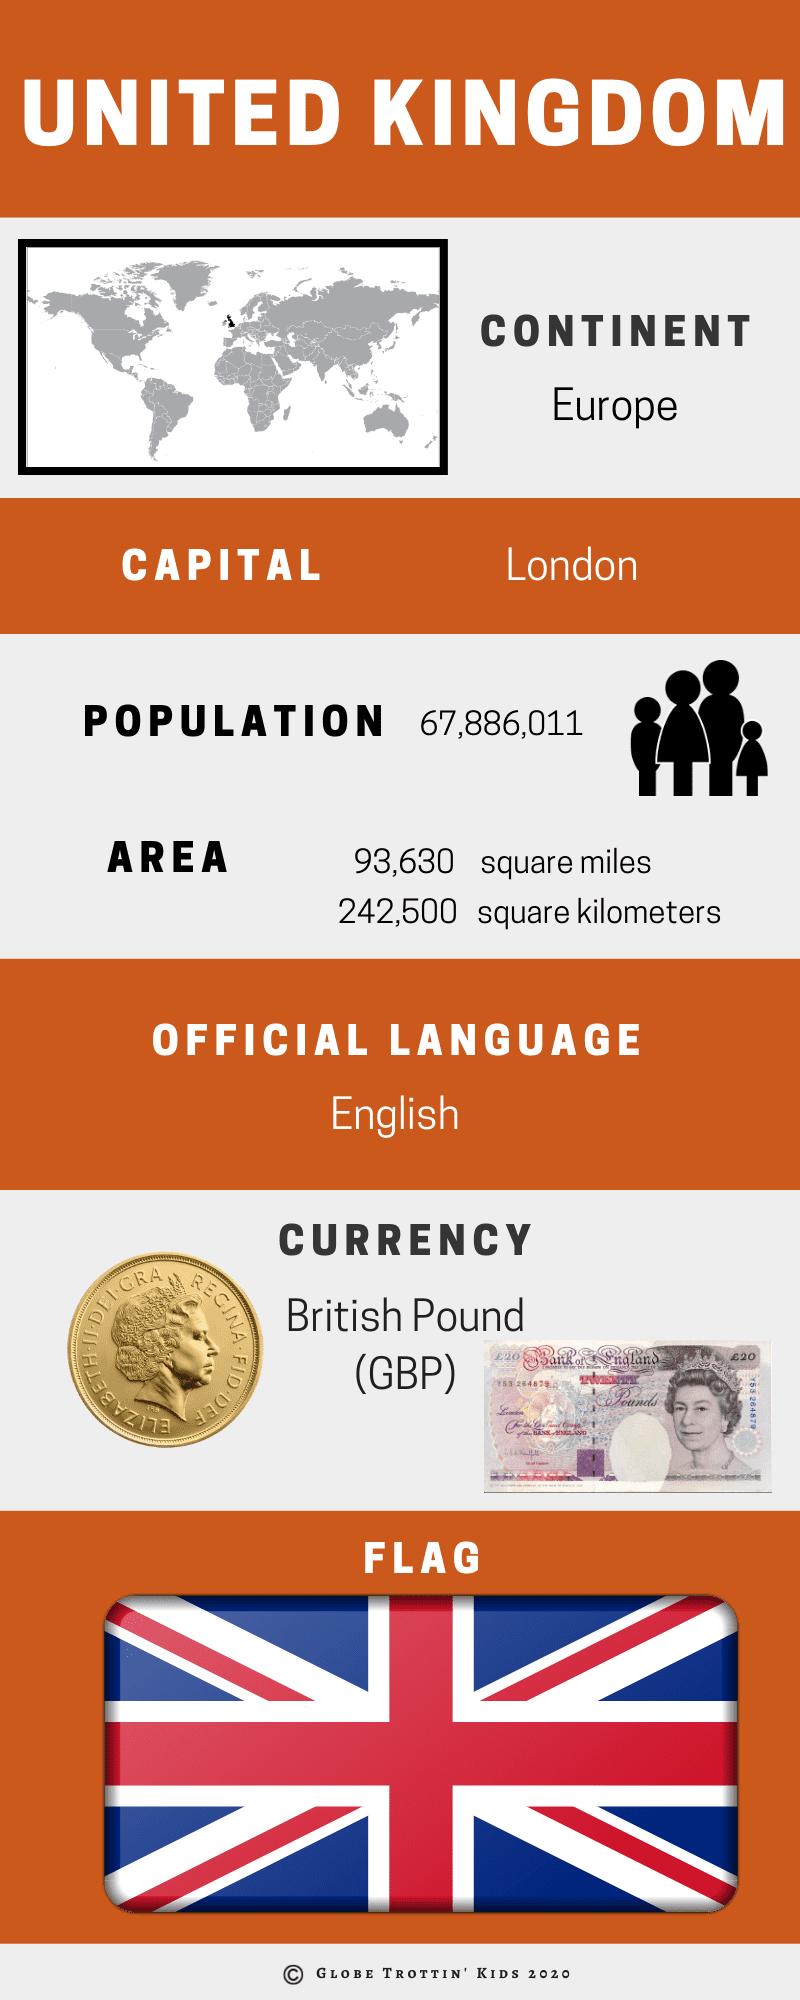 _UK Infographic